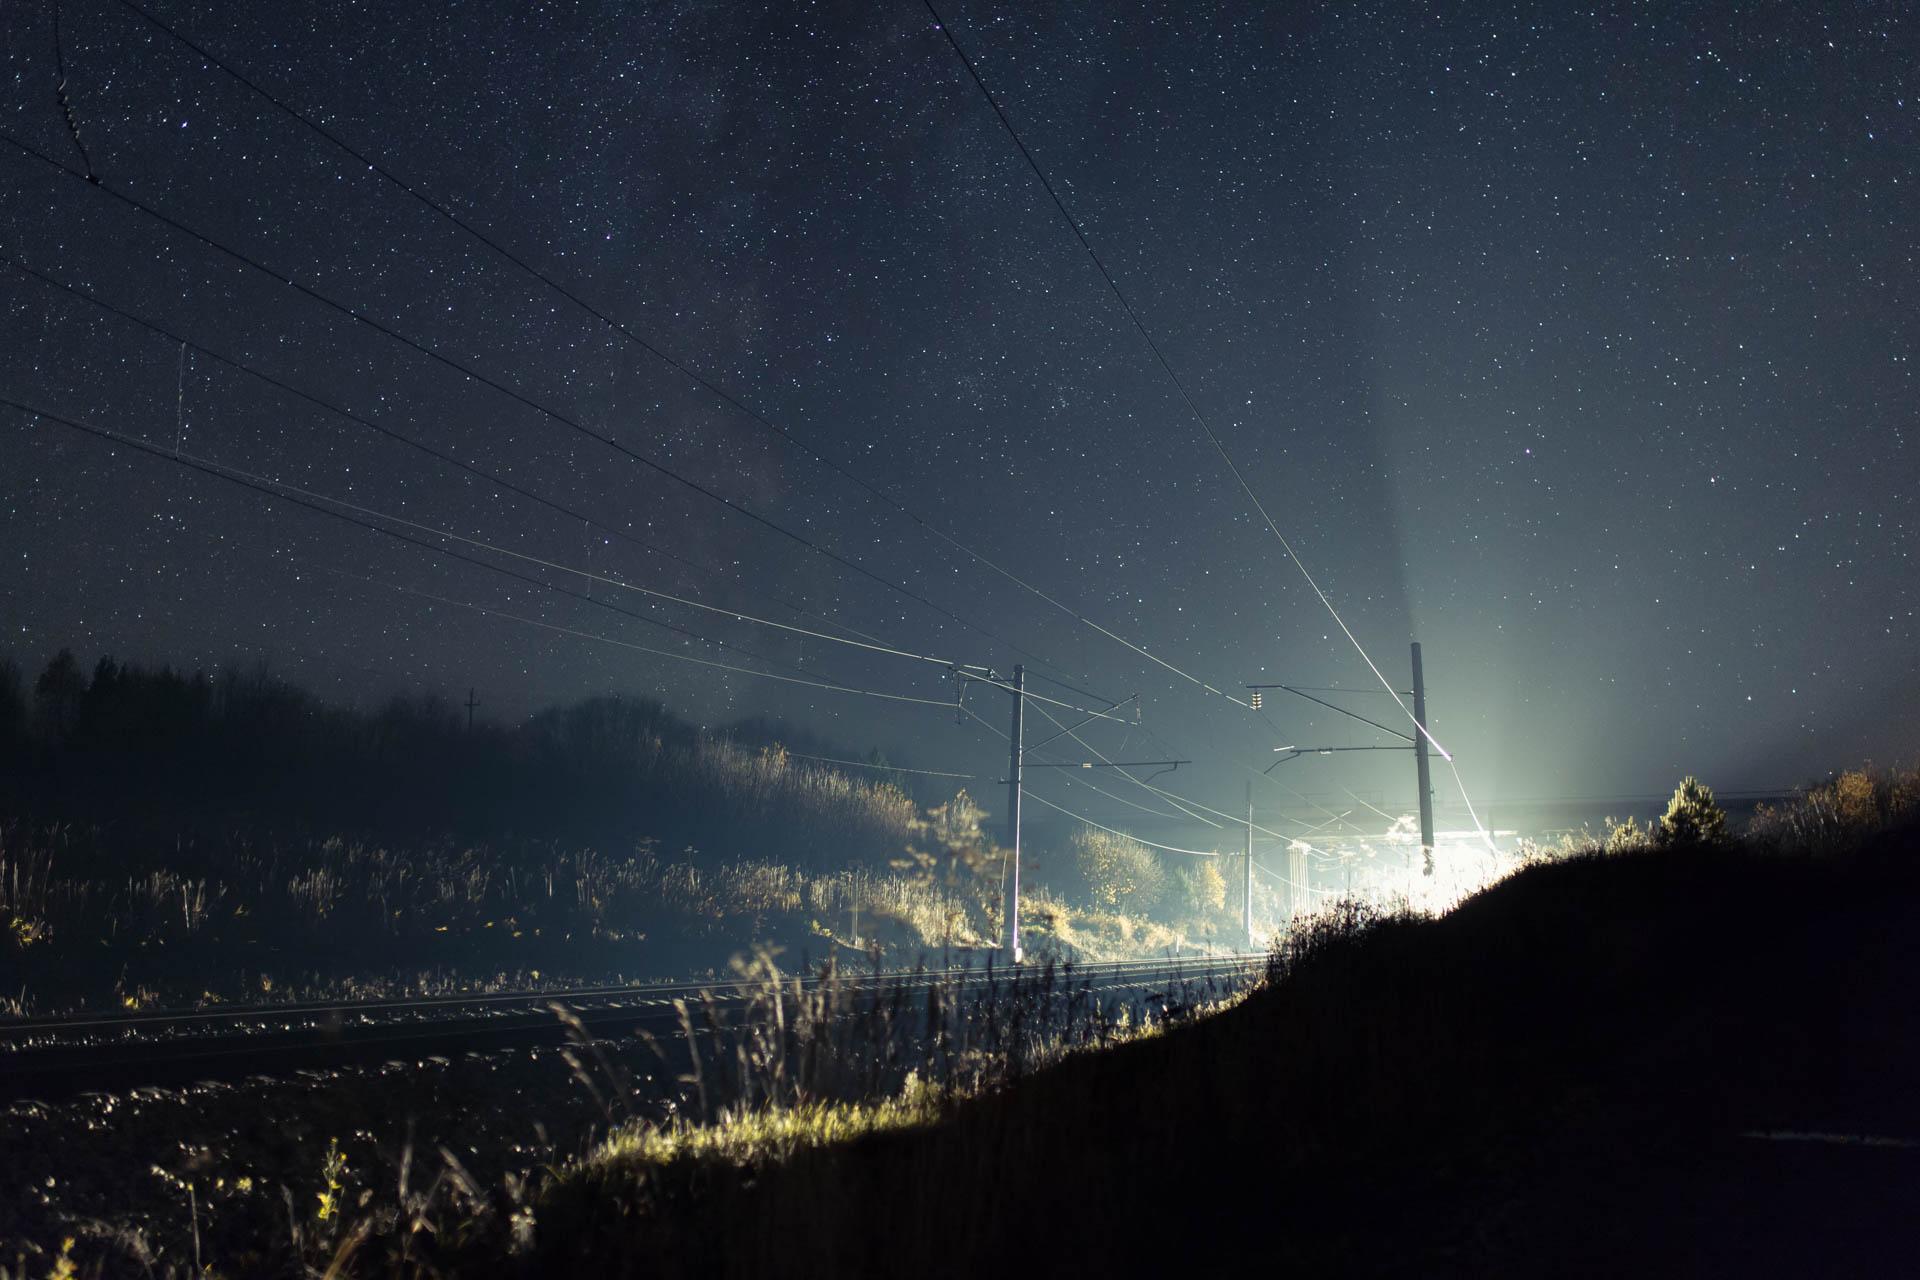 night train starry sky